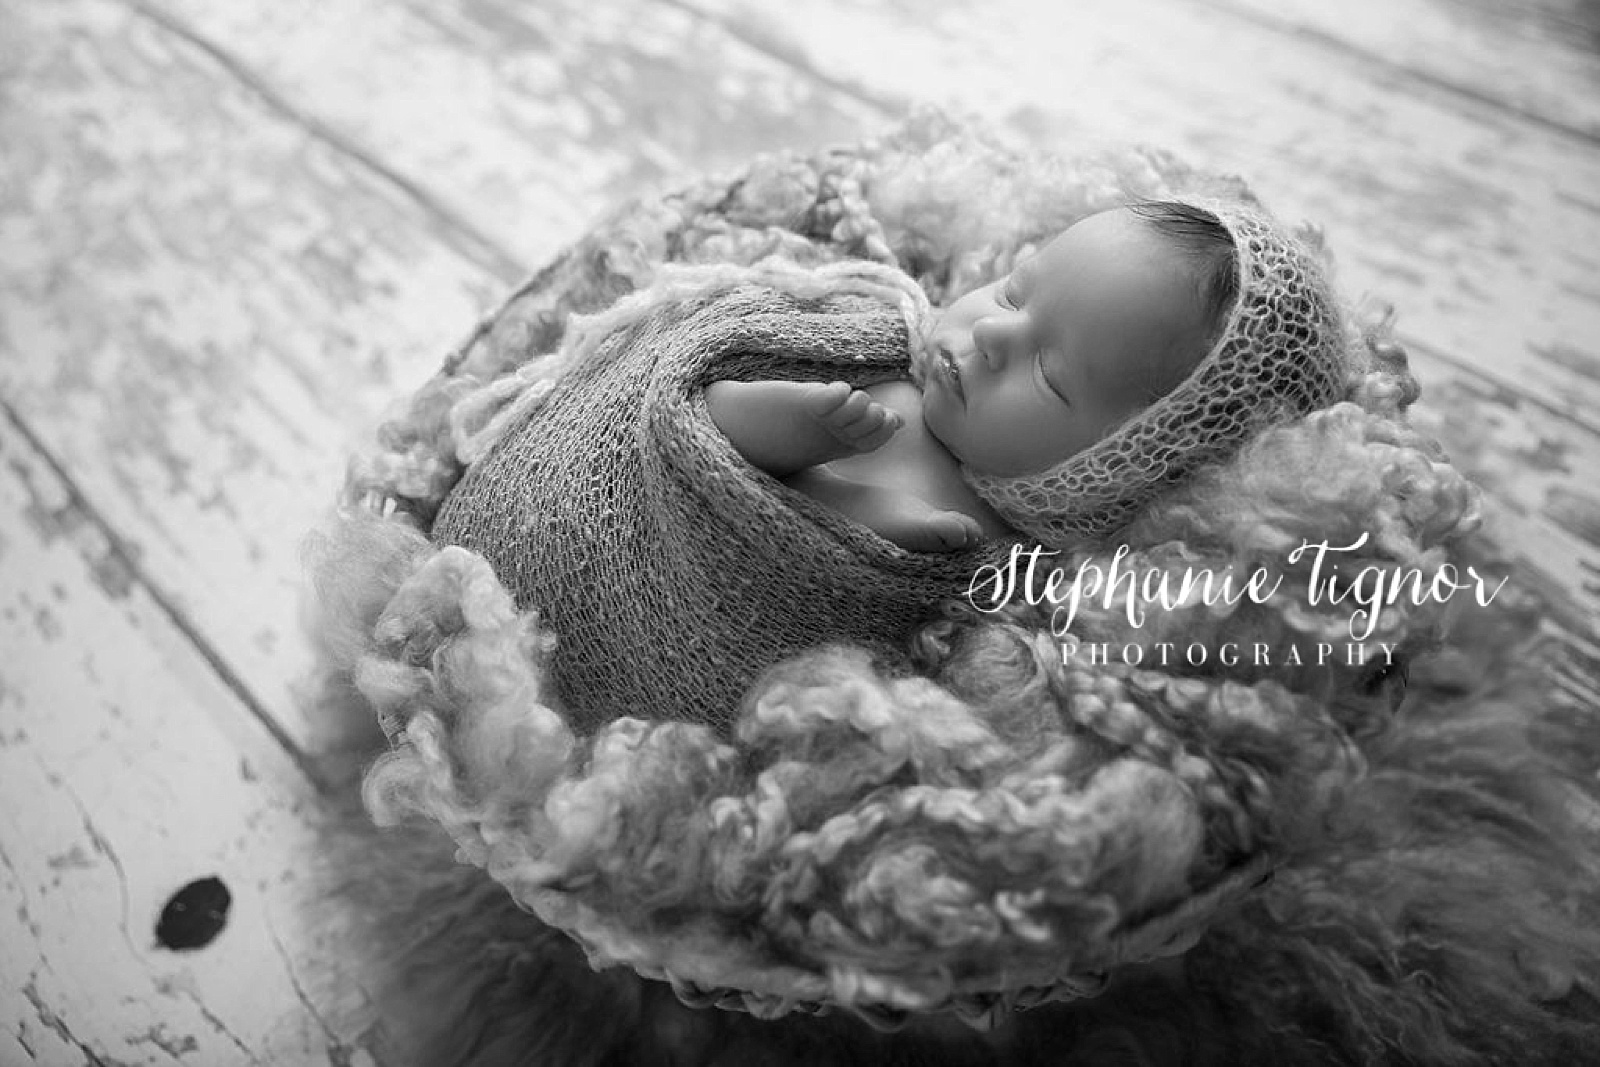 Stephanie Tignor Photography | Fredericksburg VA Newborn Photographer | Warrenton VA Newborn Photographer | Stafford VA Newborn Photographer | Newborn Photographer | Fairfax VA Newborn Photographer | Spotsylvania VA Newborn Photographer | Virginia Newborn Photographer